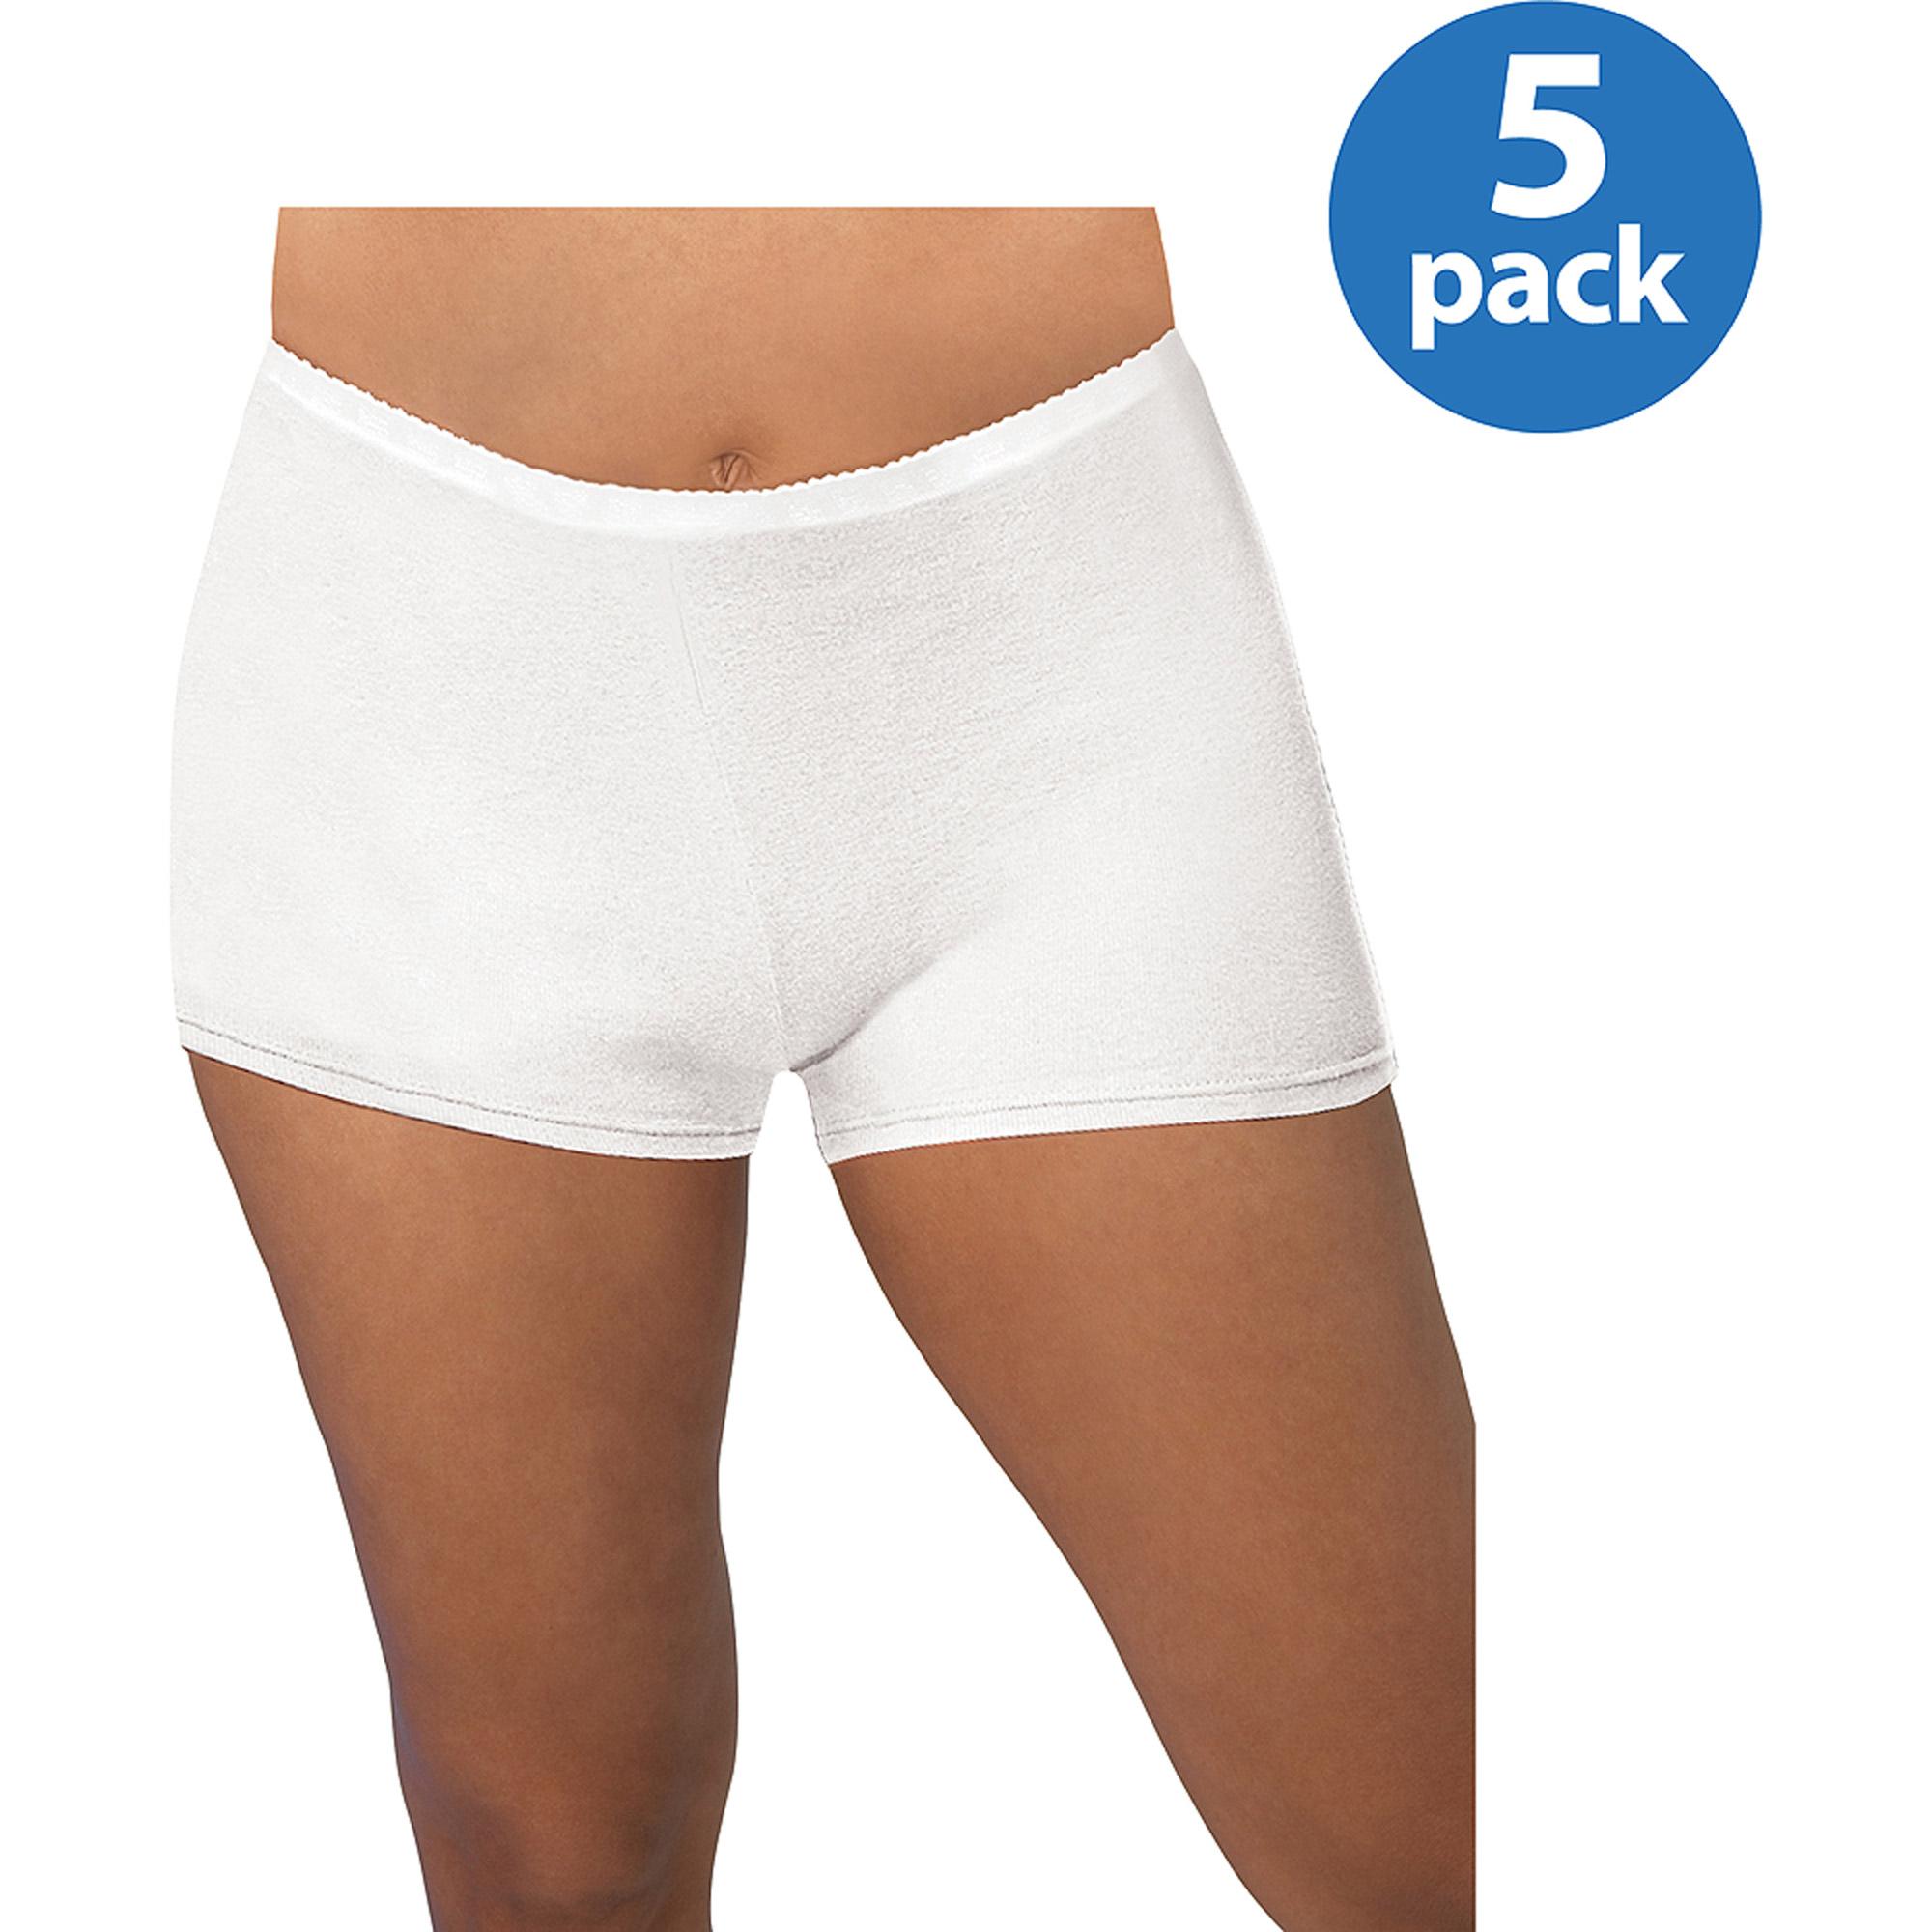 Just My Size Cotton Boyshort Panties 5 Pack